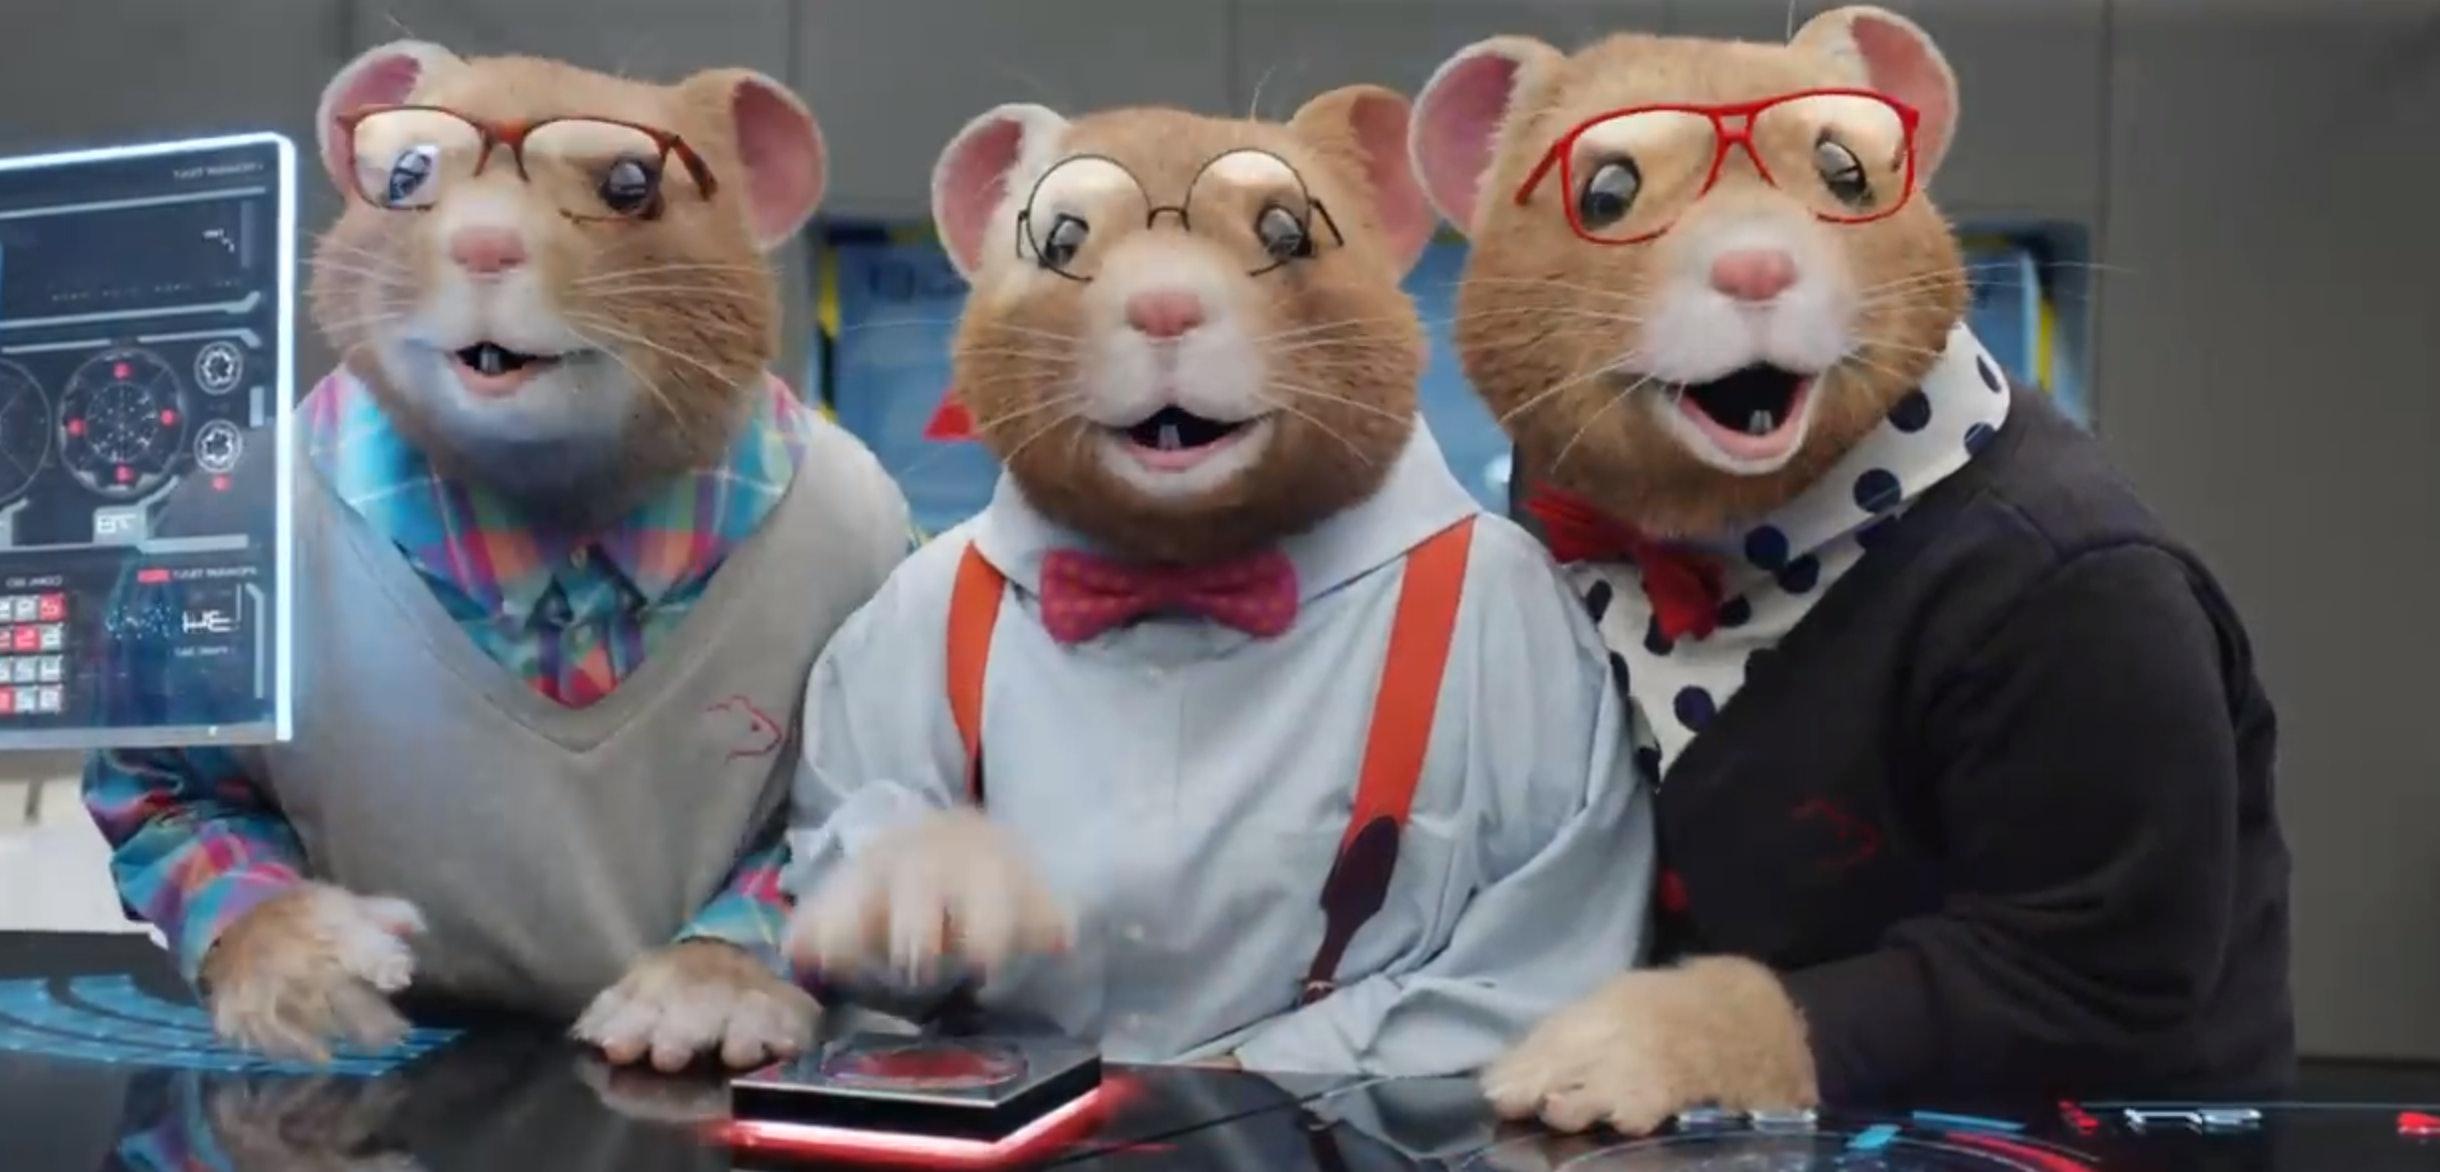 Kia Ad With Scientist Hamsters Is Super Creepy U2014 VIDEO